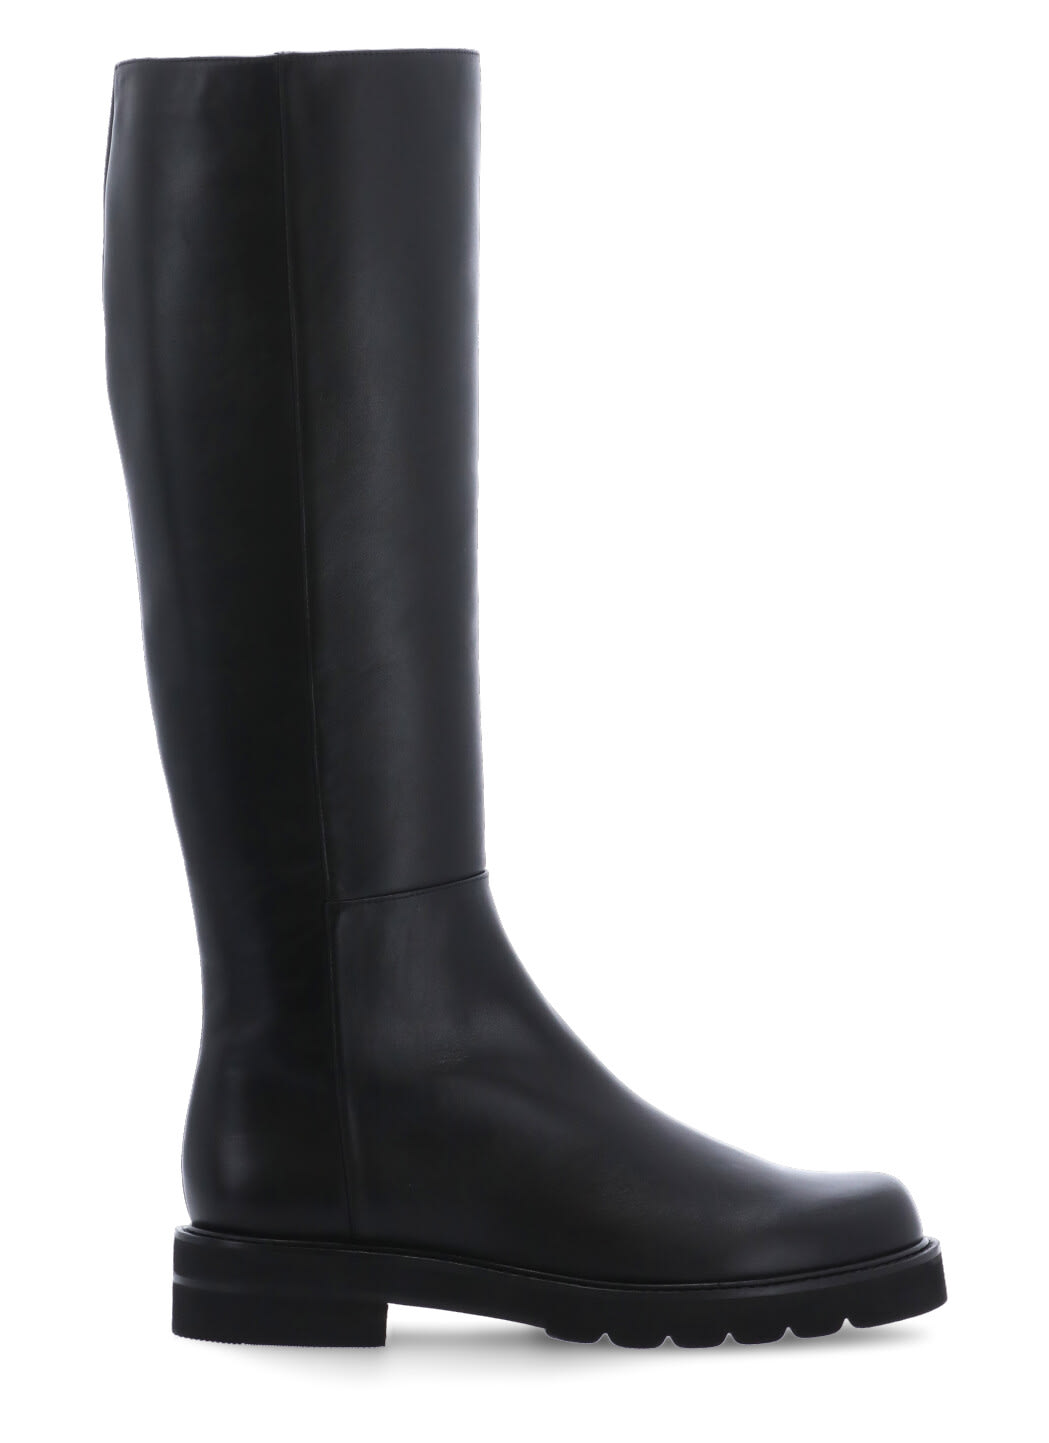 Stuart Weitzman Mila Lift Boot